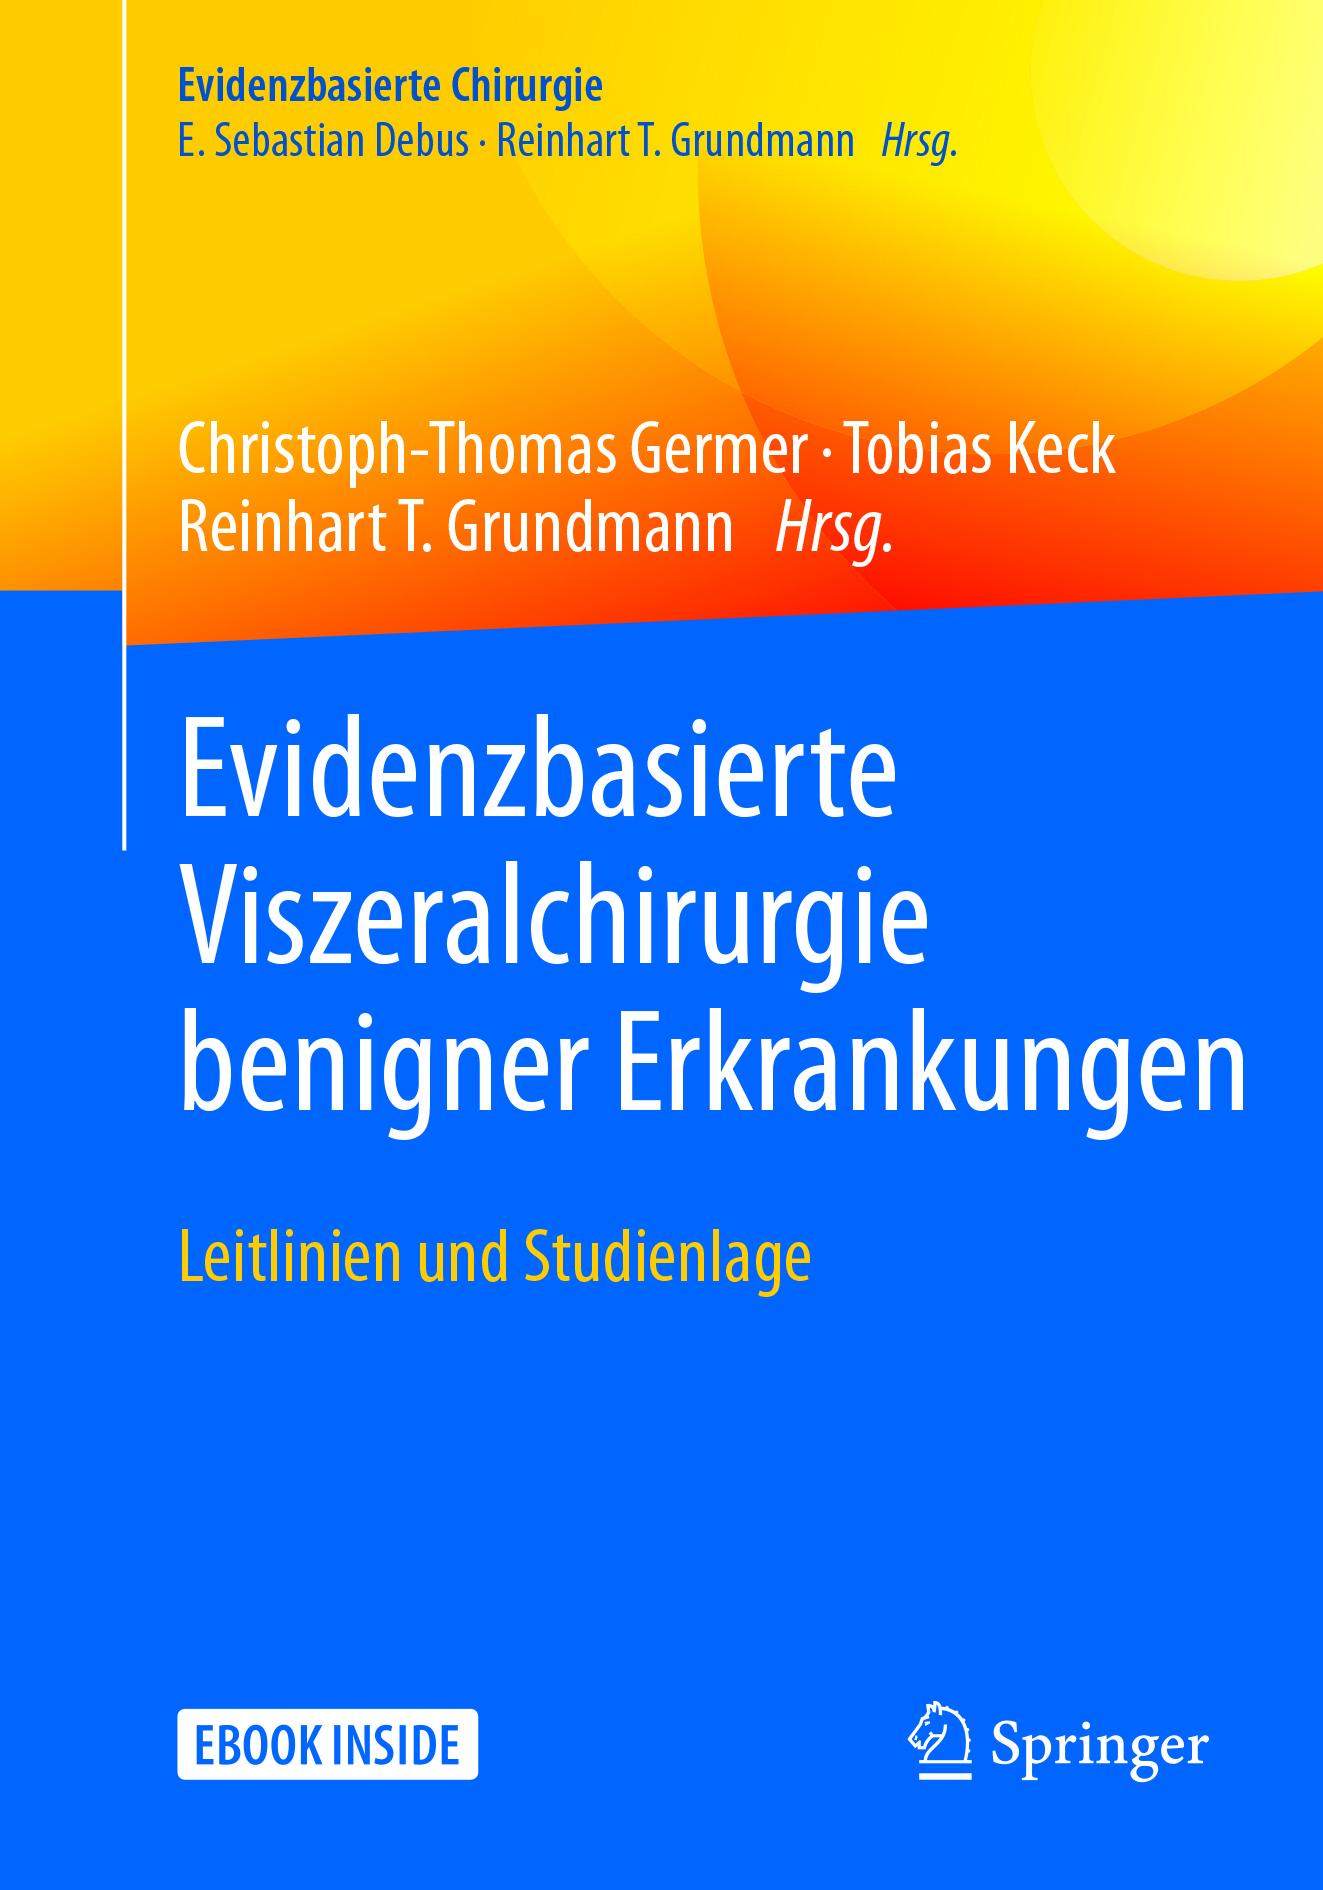 Germer, Christoph-Thomas - Evidenzbasierte Viszeralchirurgie benigner Erkrankungen, ebook